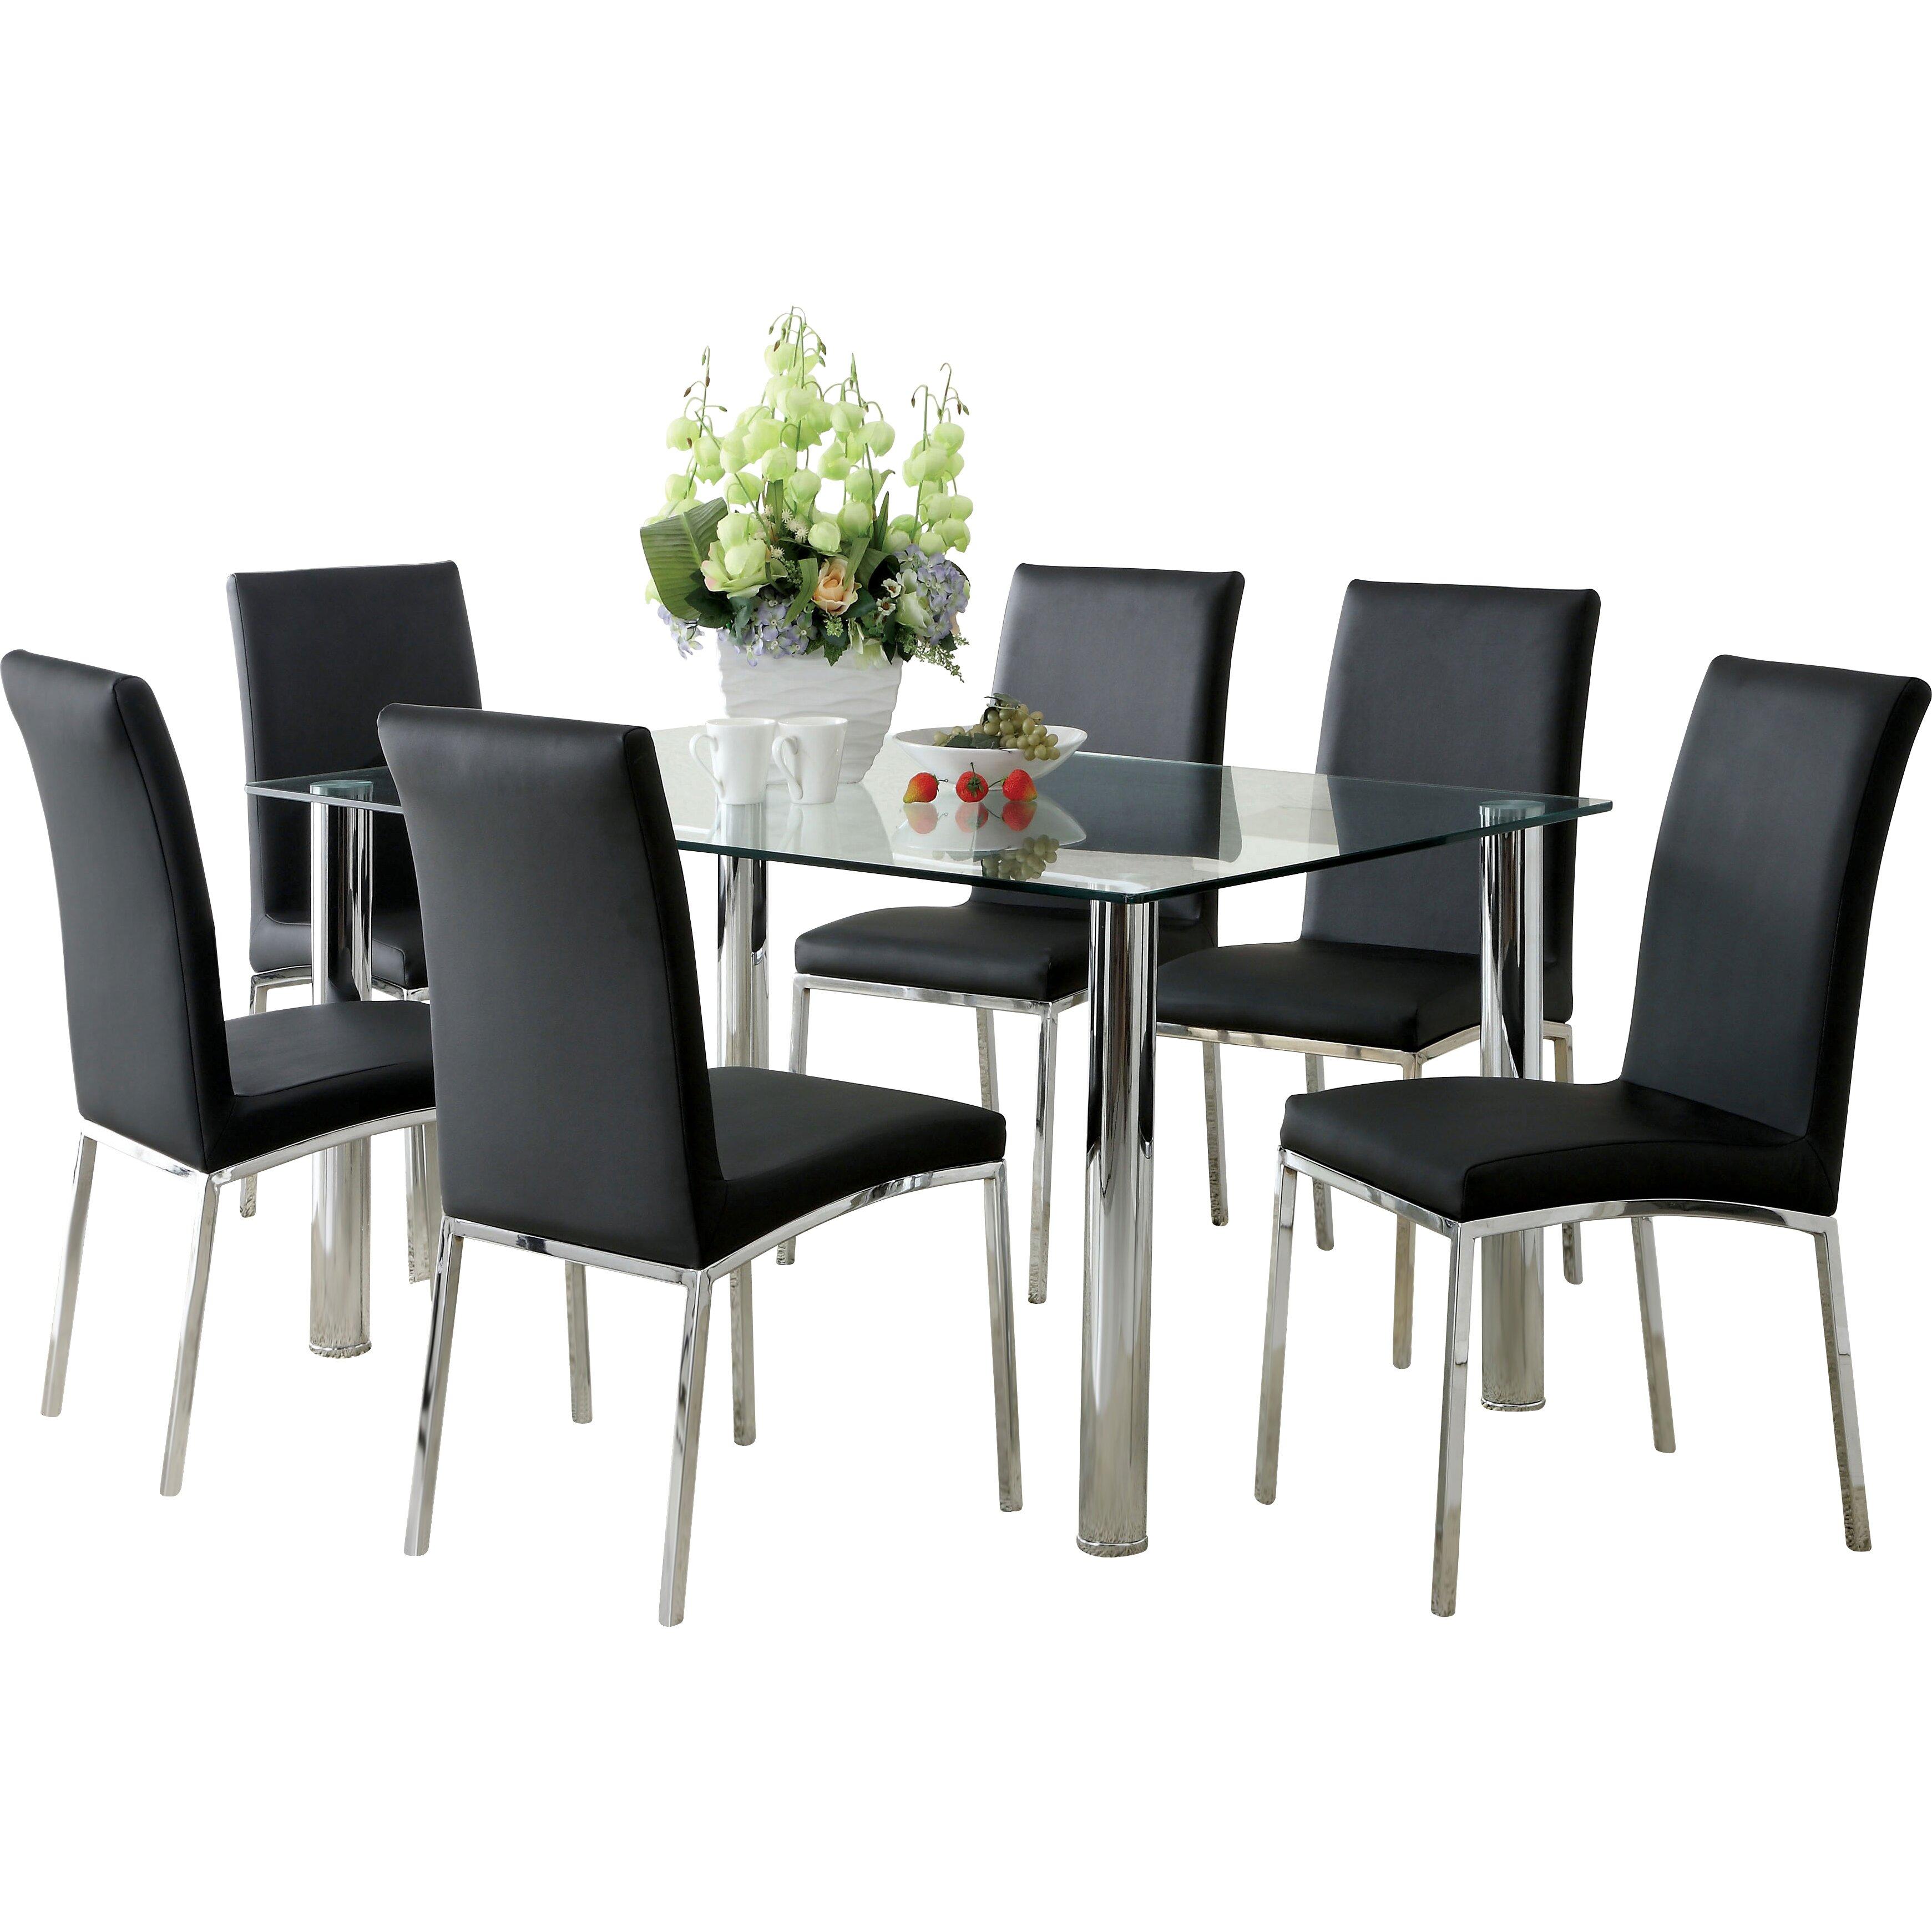 hokku designs grant 7 piece dining set image